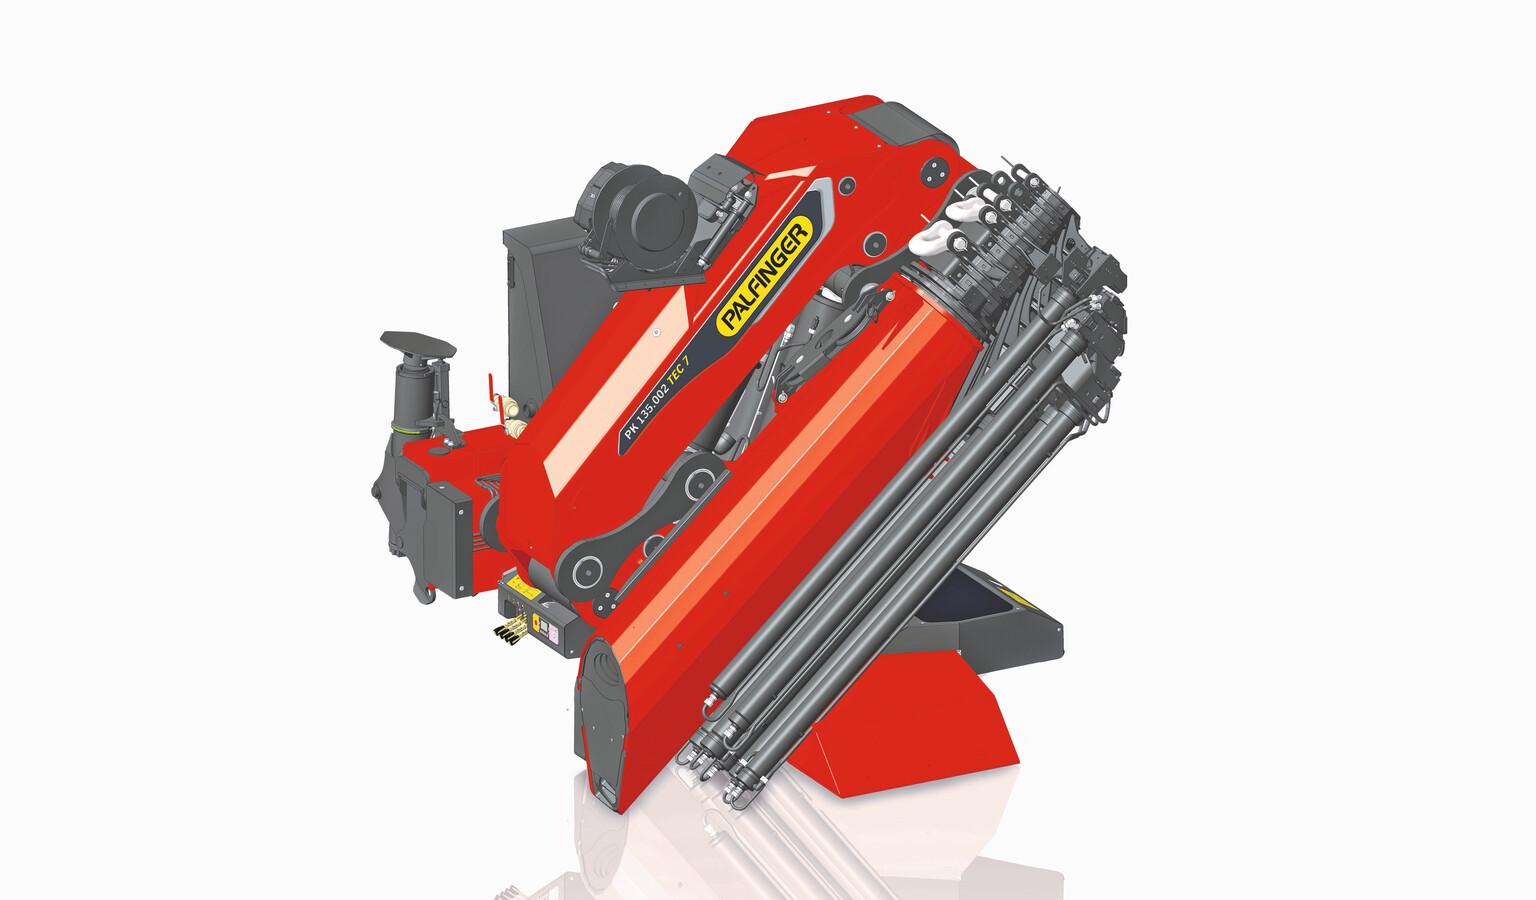 Loader Cranes Palfinger Hoist Wiring Diagram For Crane Together With Auto Pk 135002 Tec 7